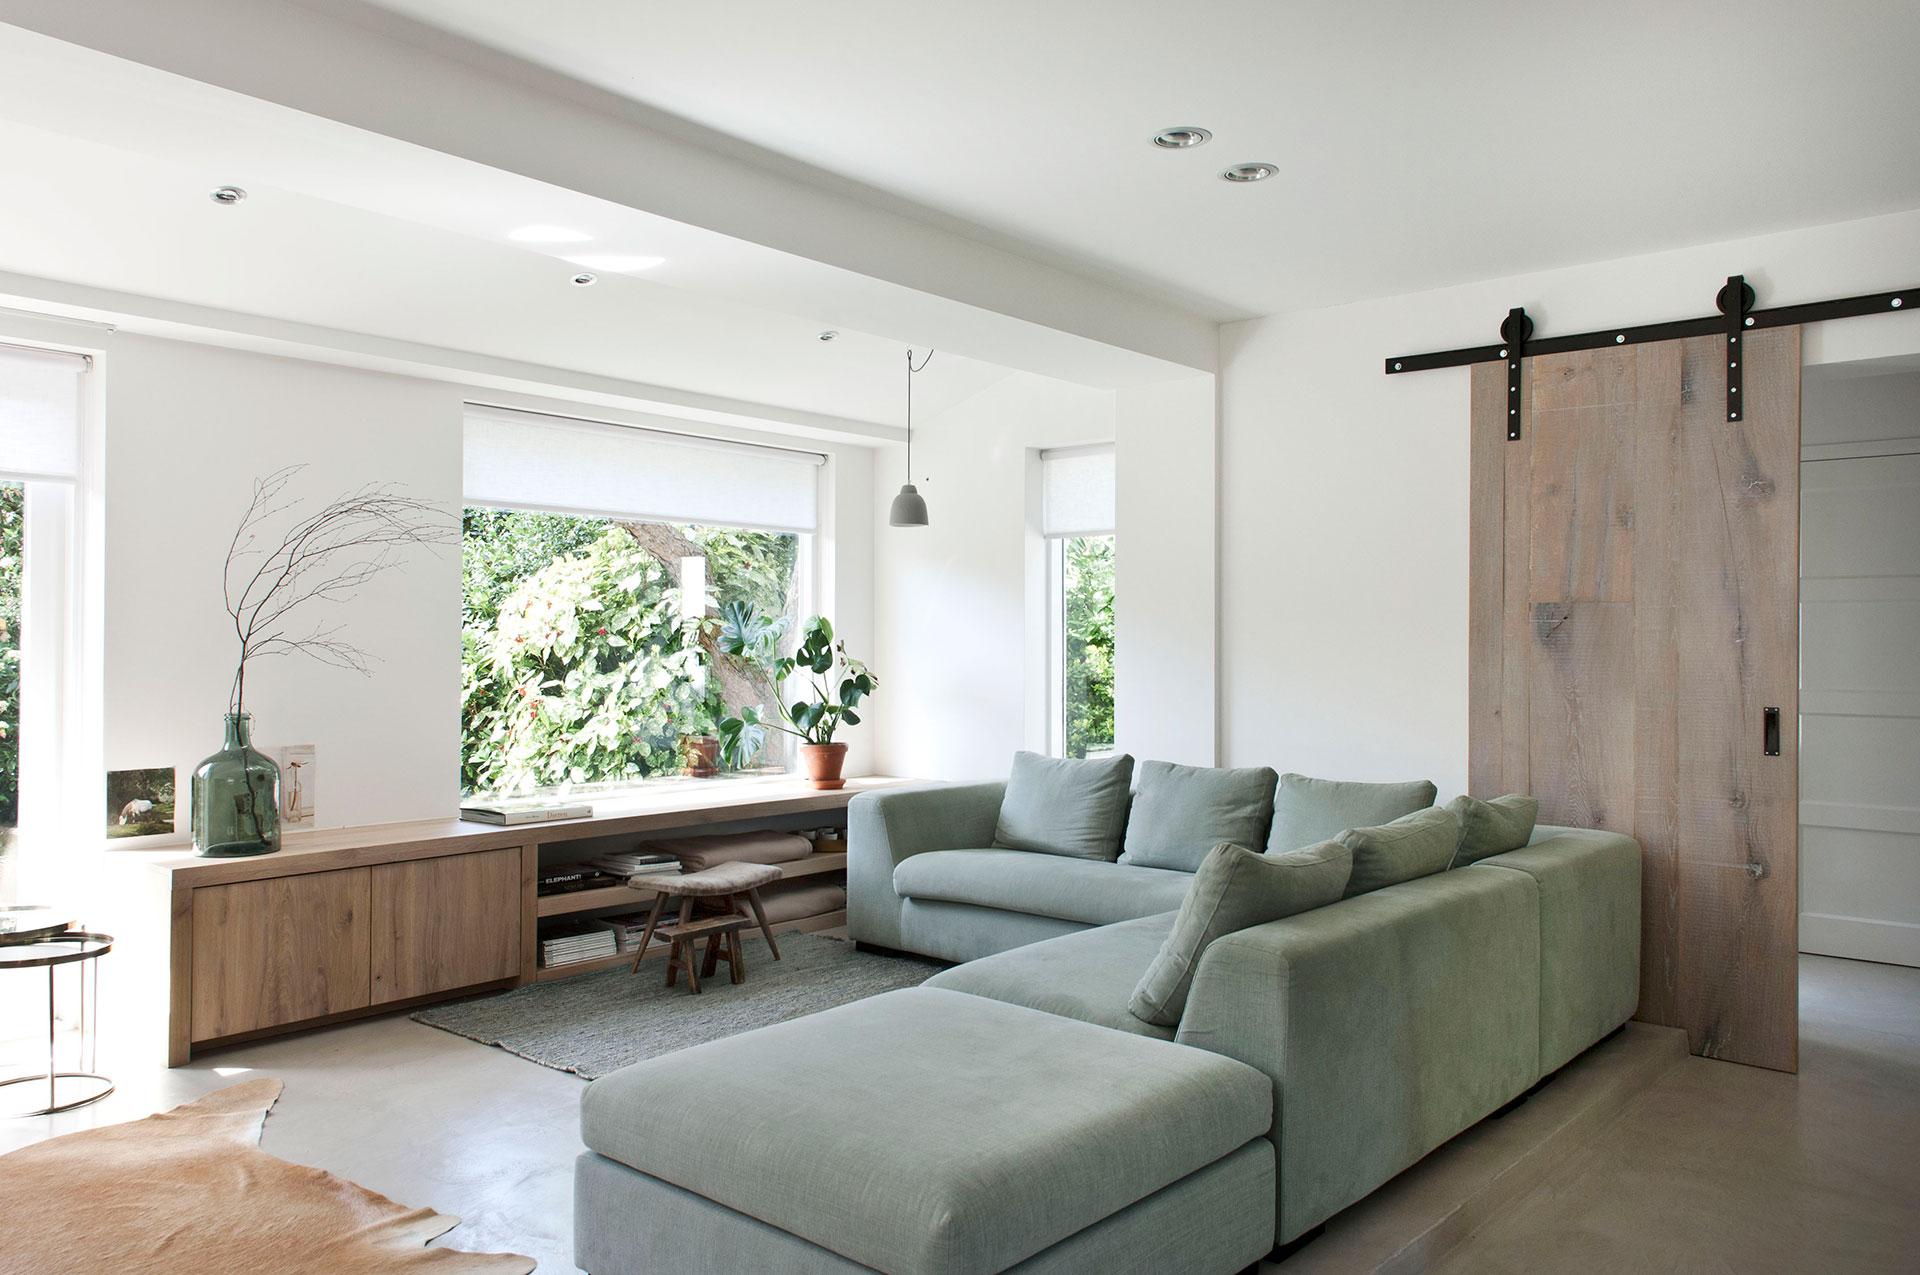 Handgemaakt meubilair